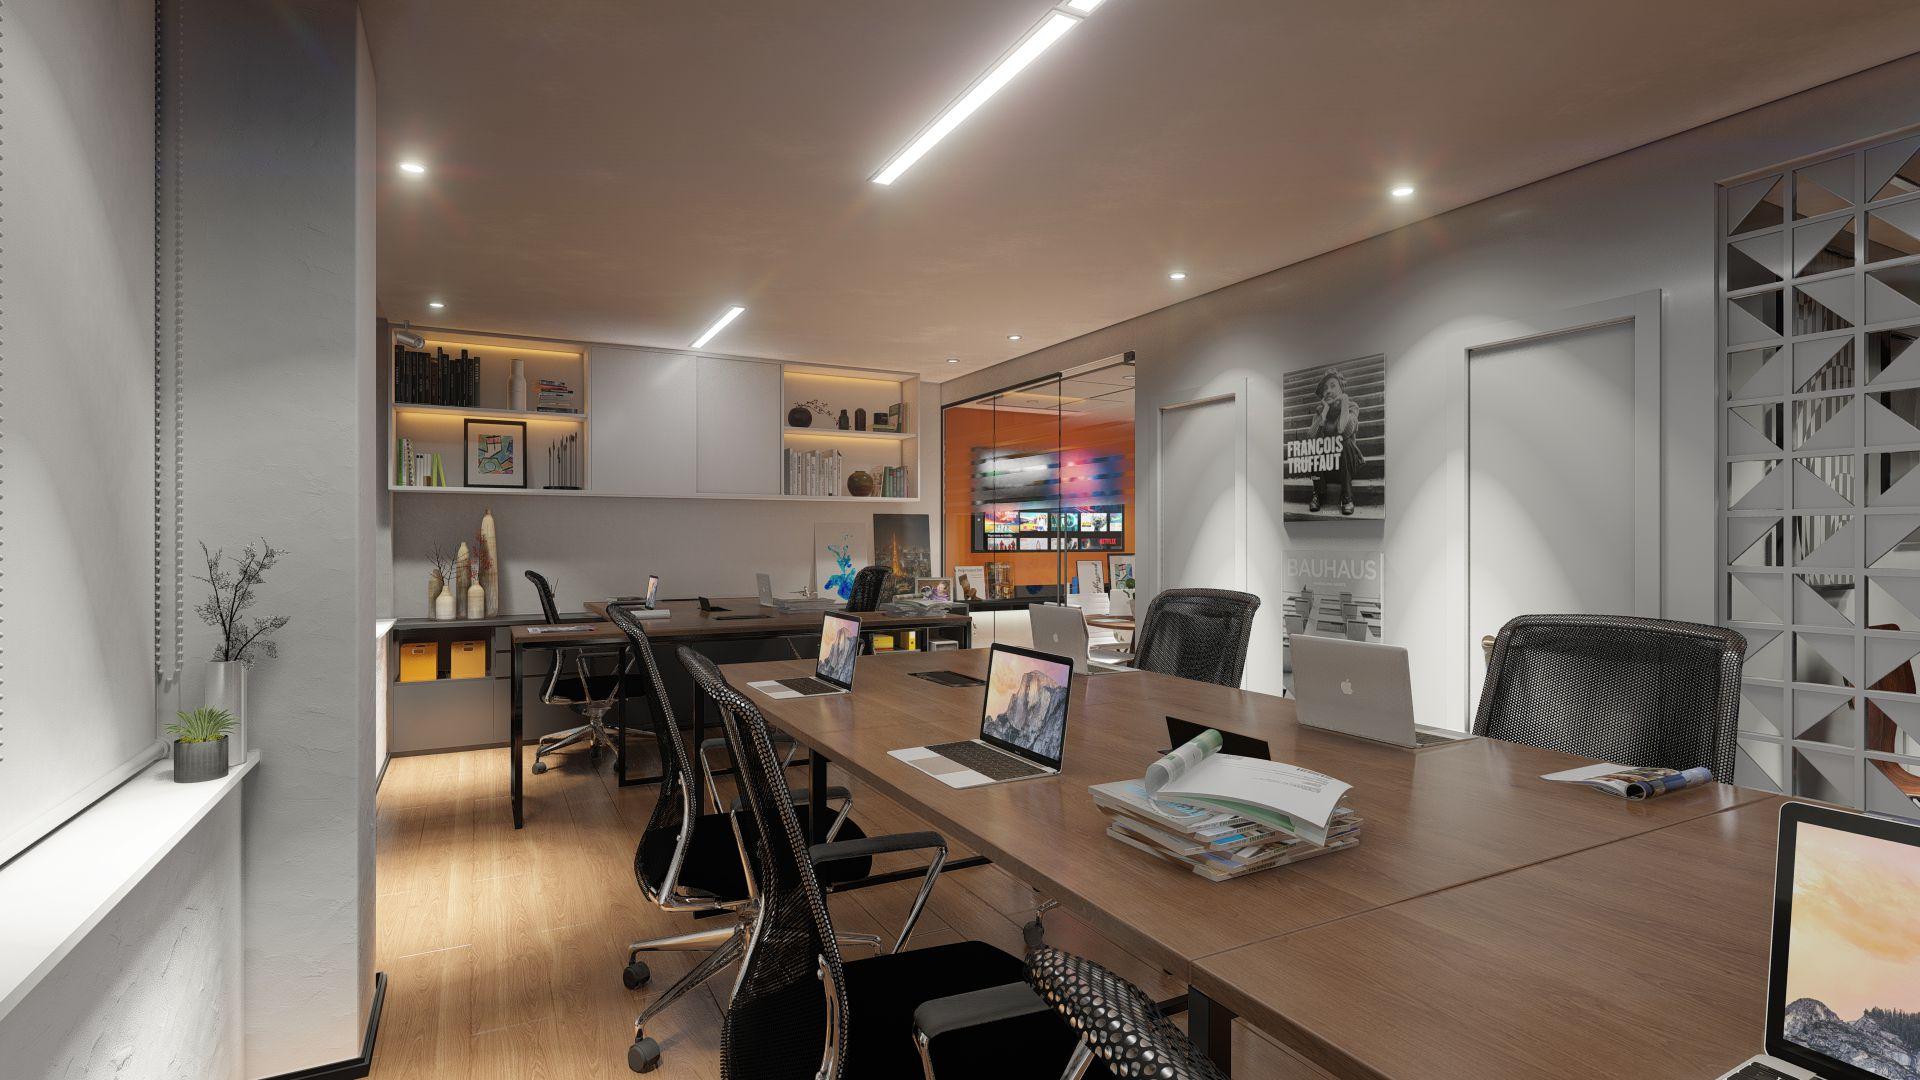 Conference room, model provided by Angello Marques Arquitetura e Design.